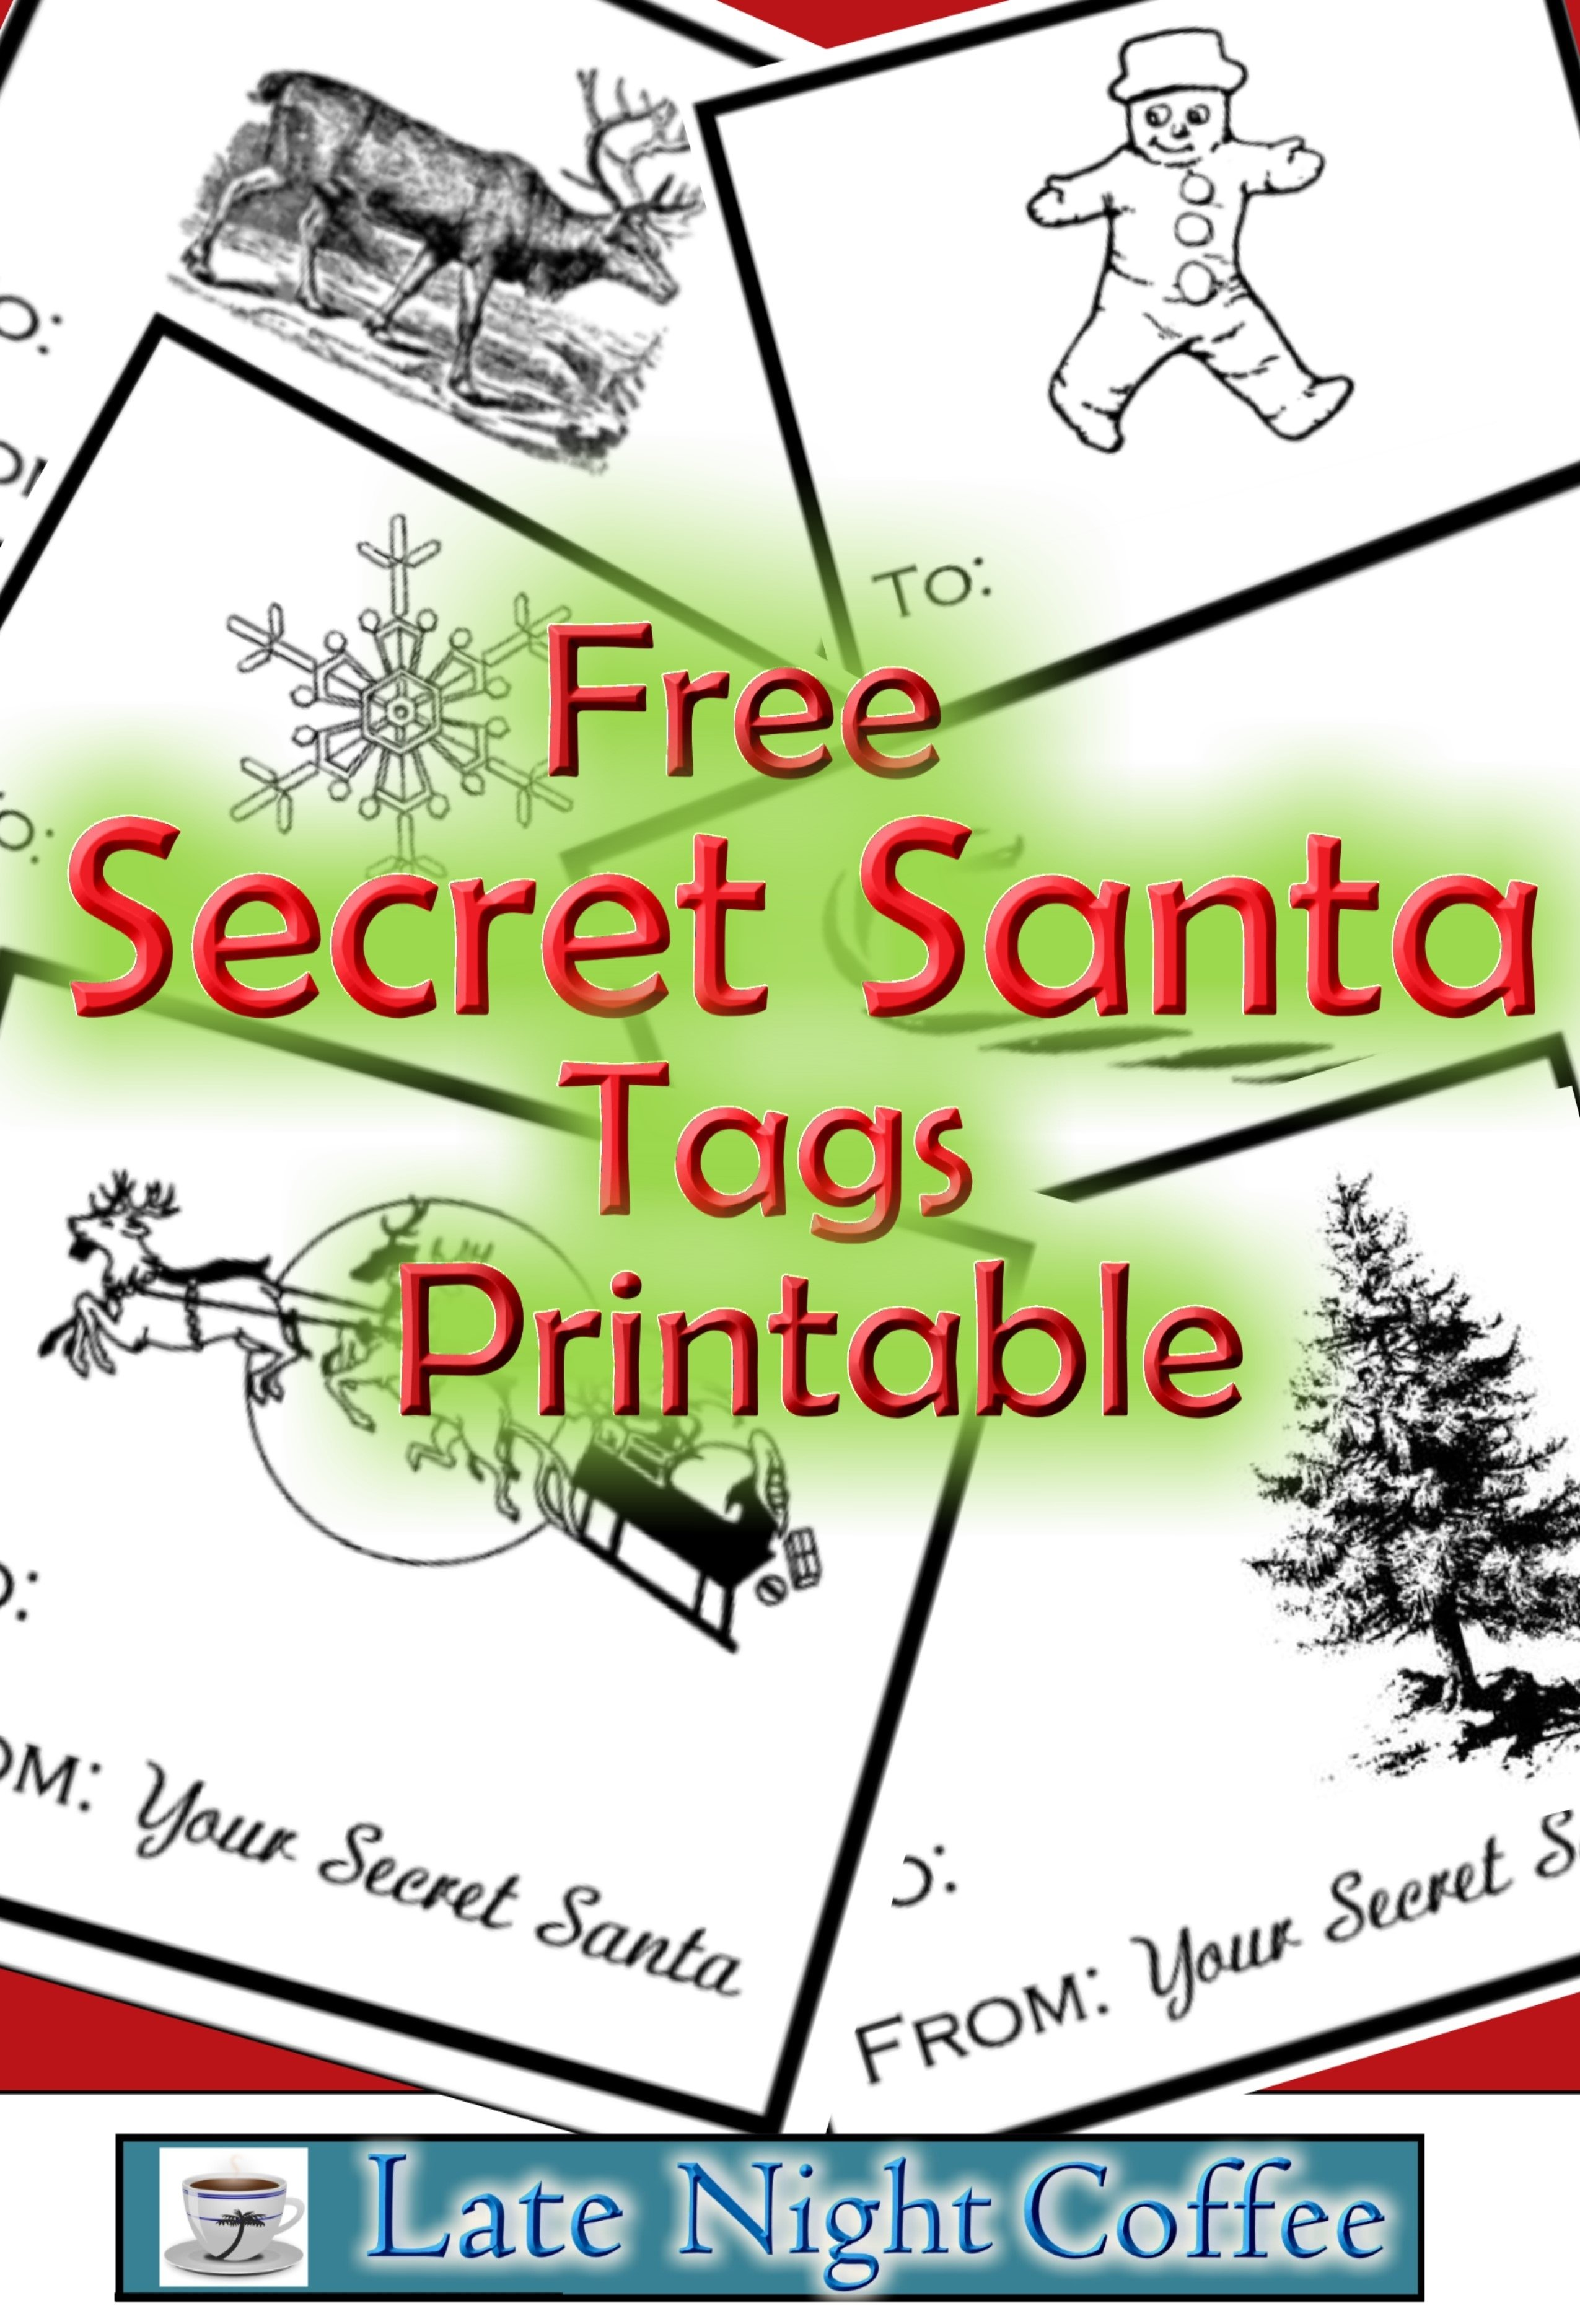 10 Fantastic Secret Santa Ideas For School free secret santa tags printable highschoolherd pinterest 2020